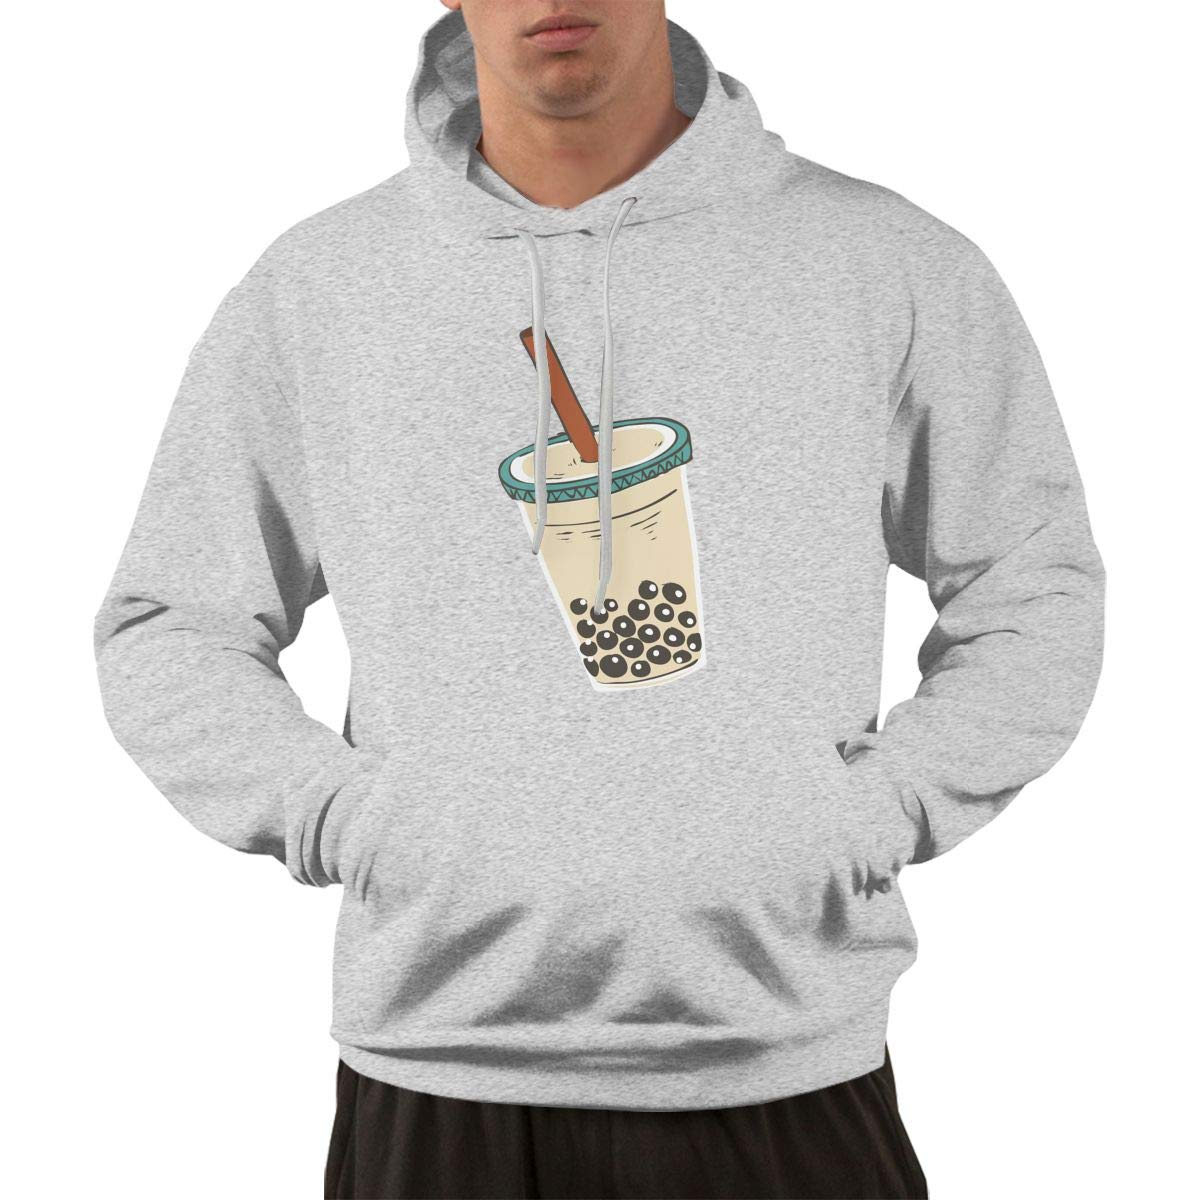 Hateone Mens 3D Print Hoodies Bubble Tea Drink Art Casual Sweatshirt with Pocket